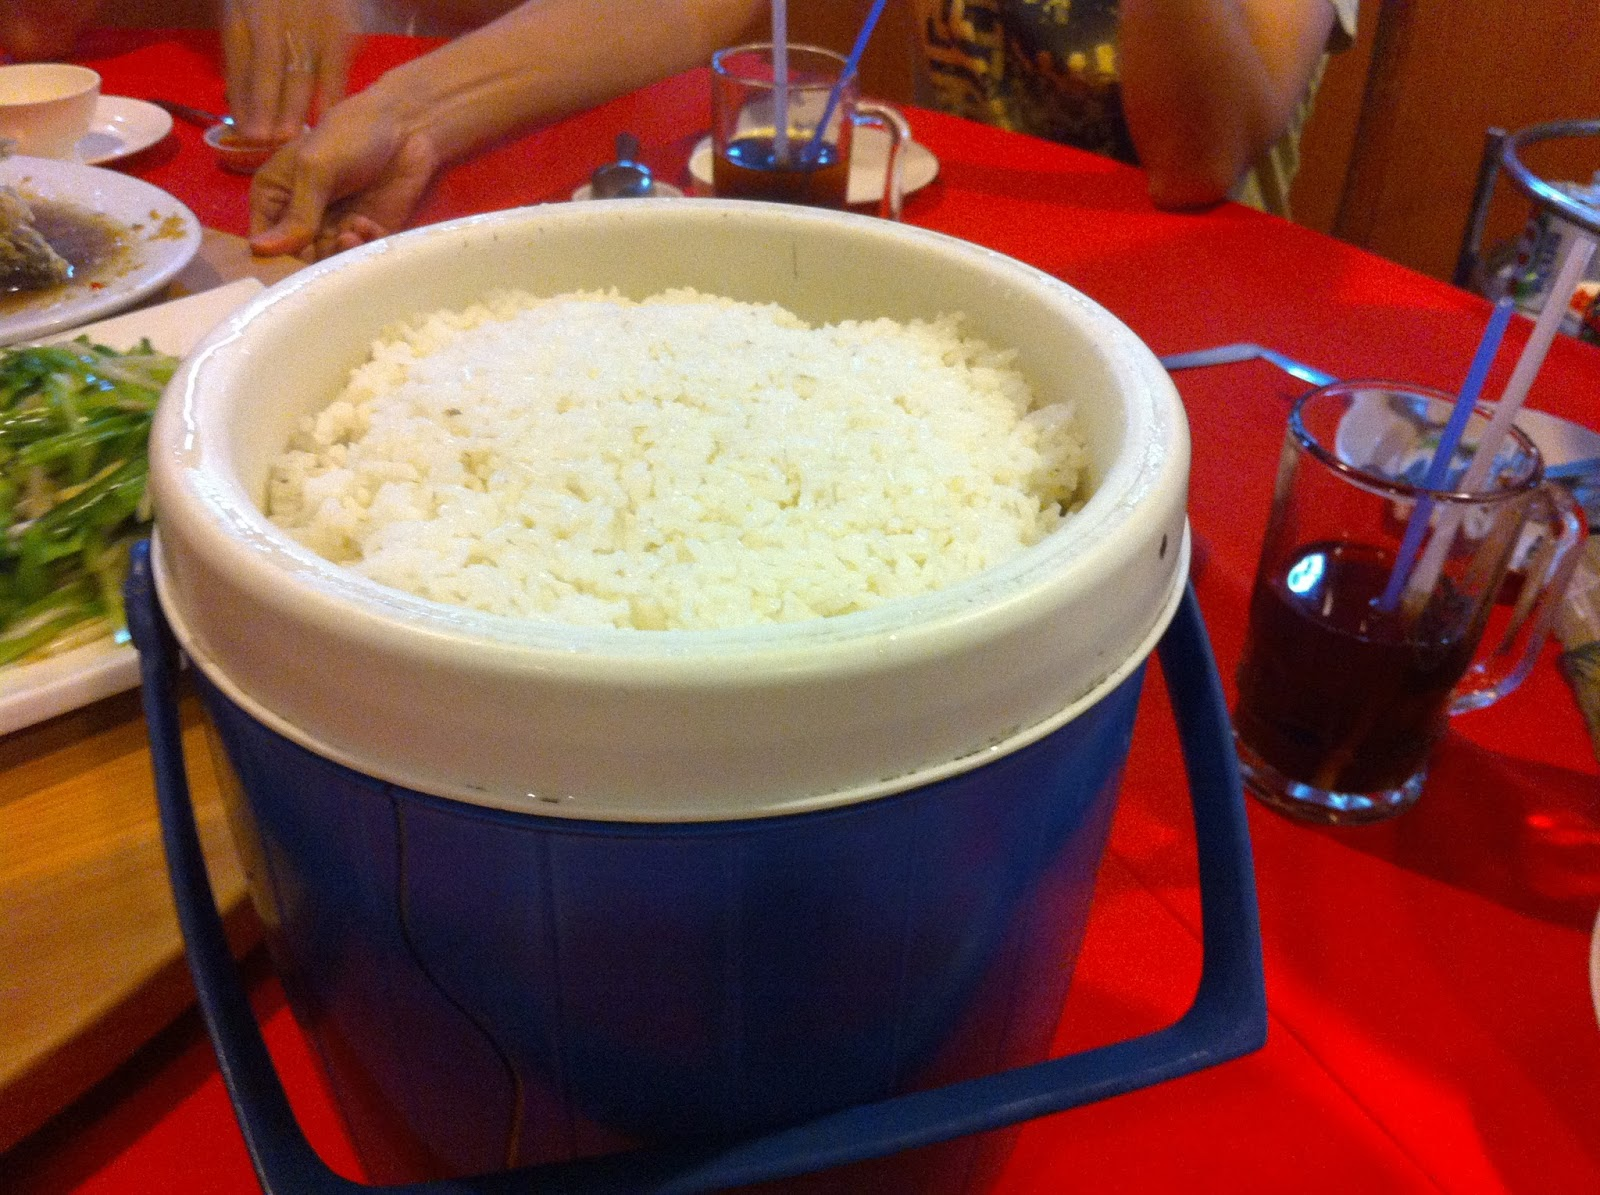 kitchen tables & more light fixtures flush mount 南海姑娘 alice lee 爱丽思厨房: 天天来海鲜饭店 restaurant seafood ...